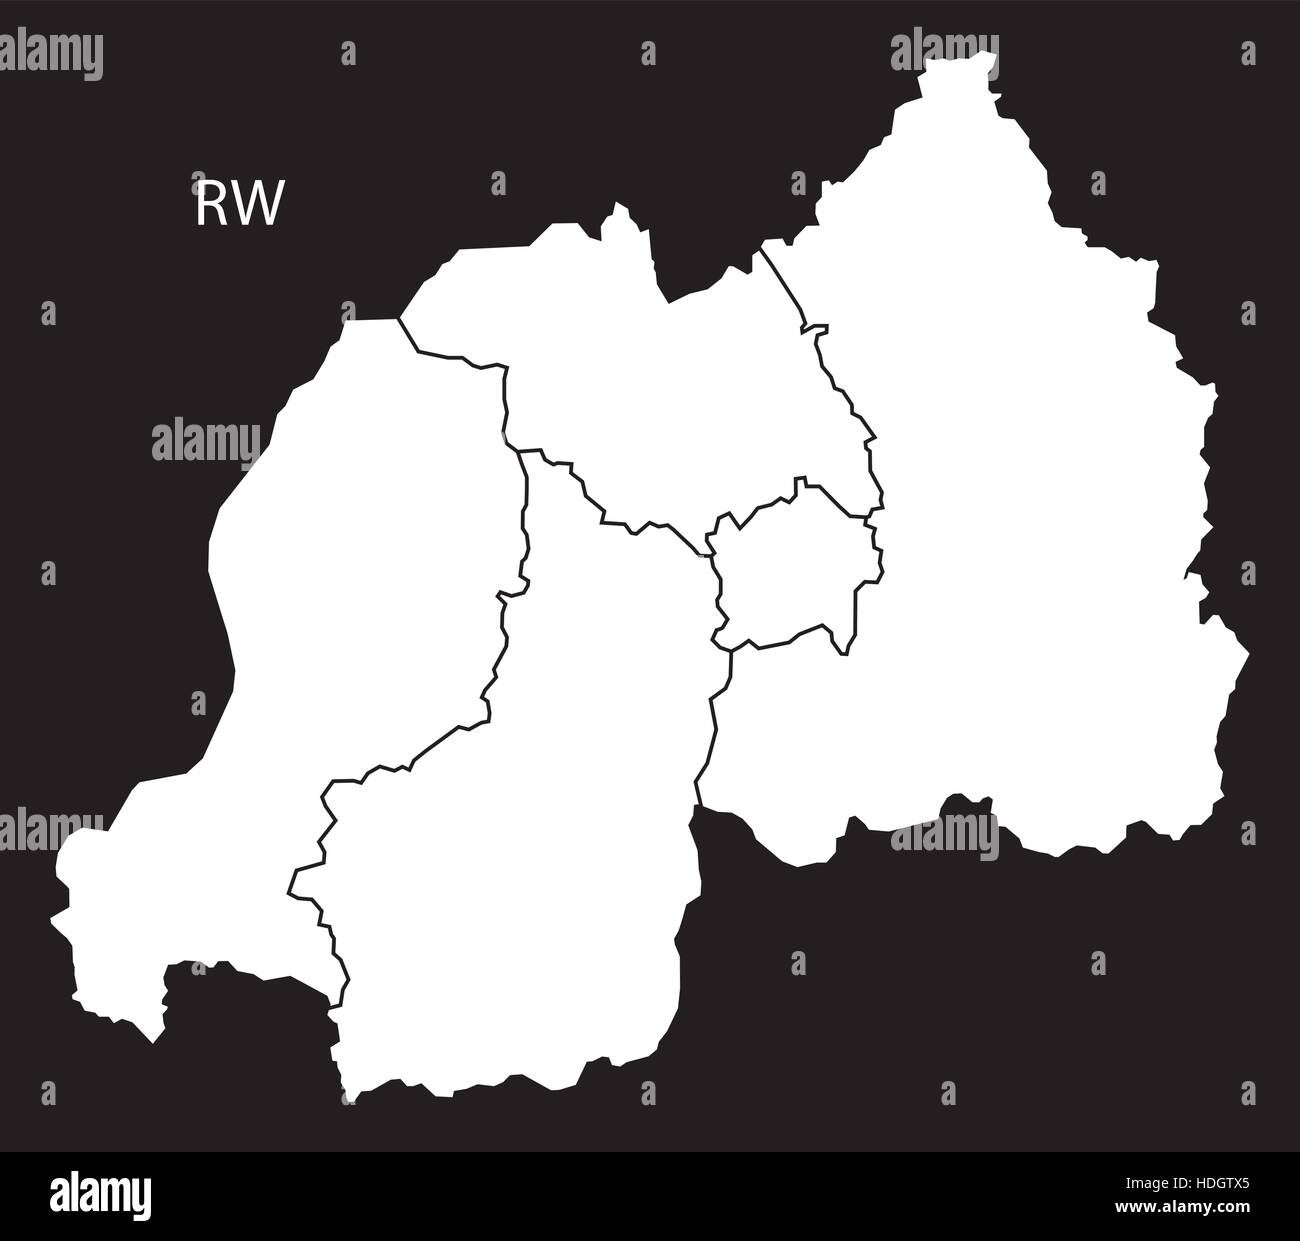 Rwanda provinces Map black and white illustration - Stock Vector